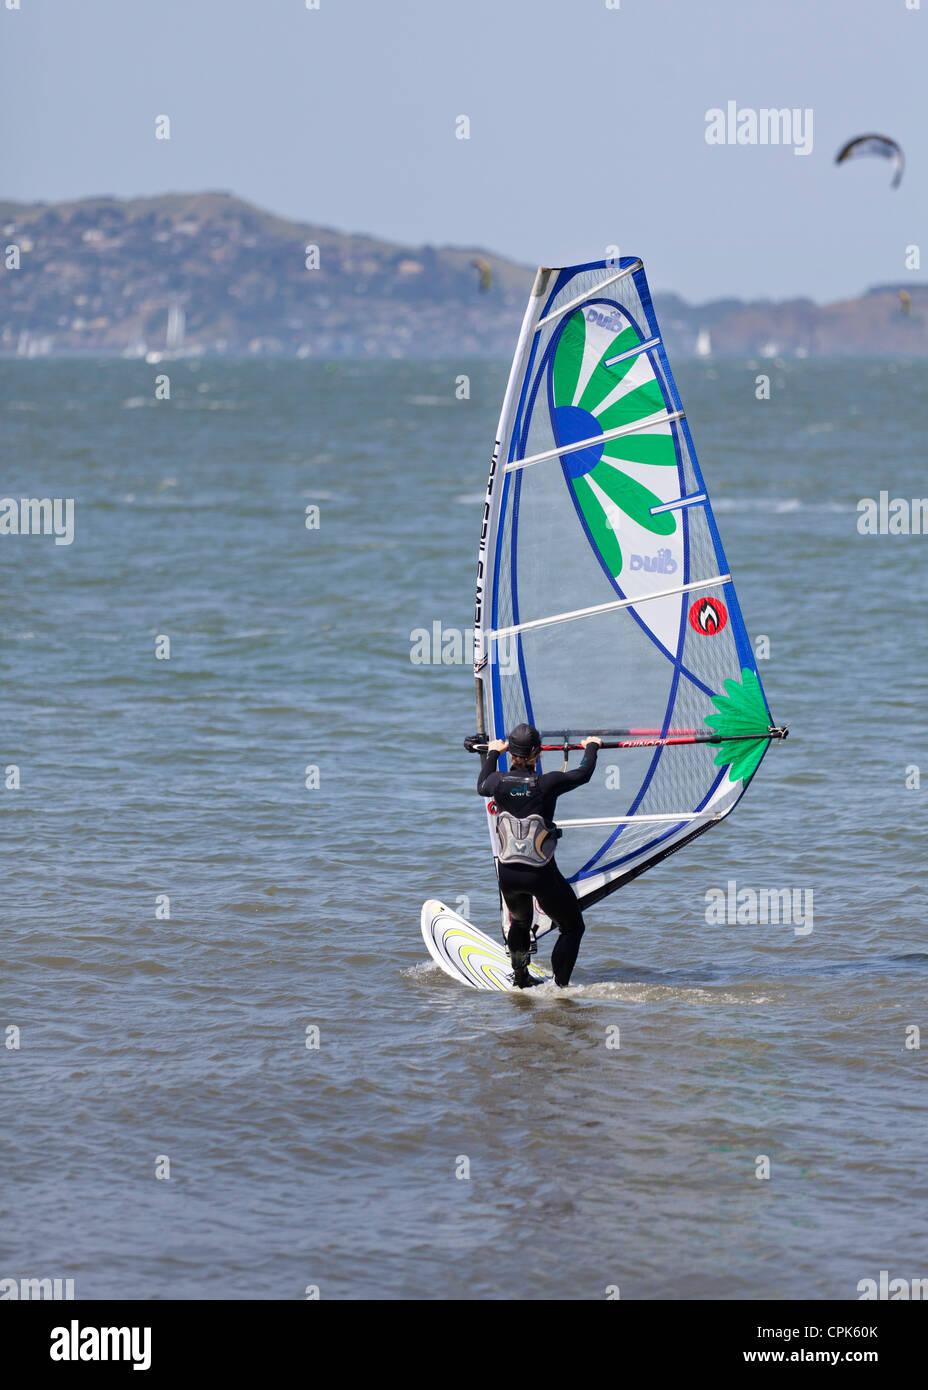 Windsurf in acqua - San Francisco, California USA Immagini Stock